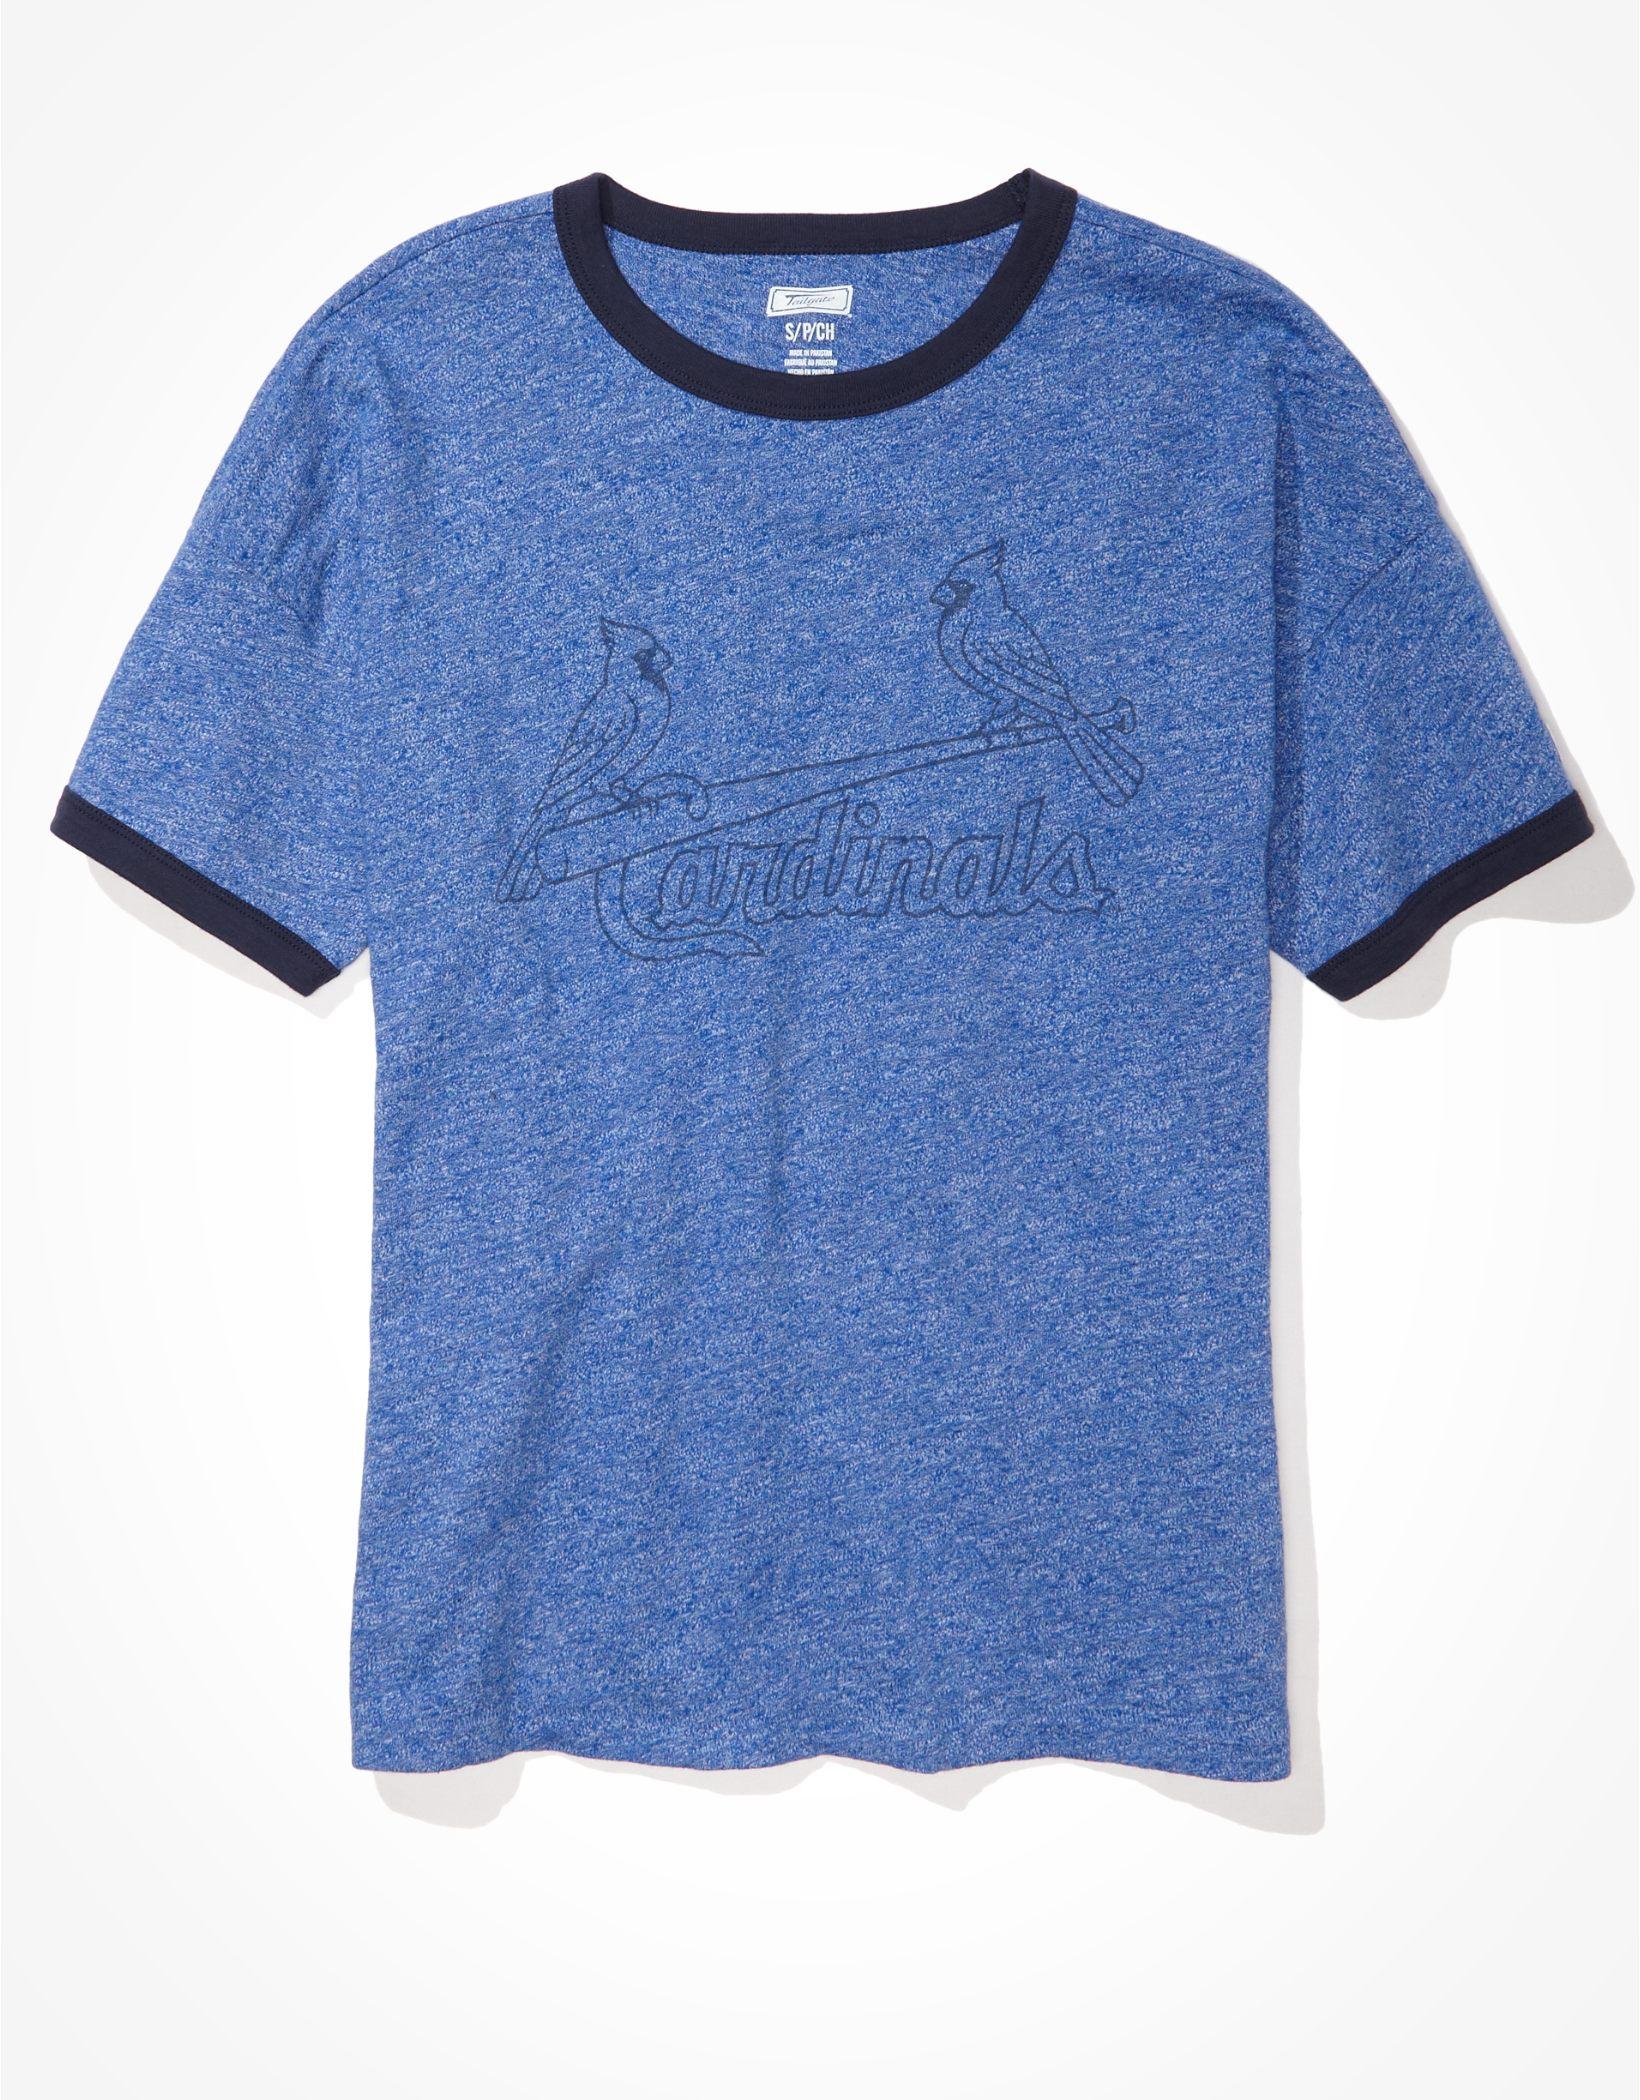 Tailgate Women's St. Louis Cardinals Ringer T-Shirt